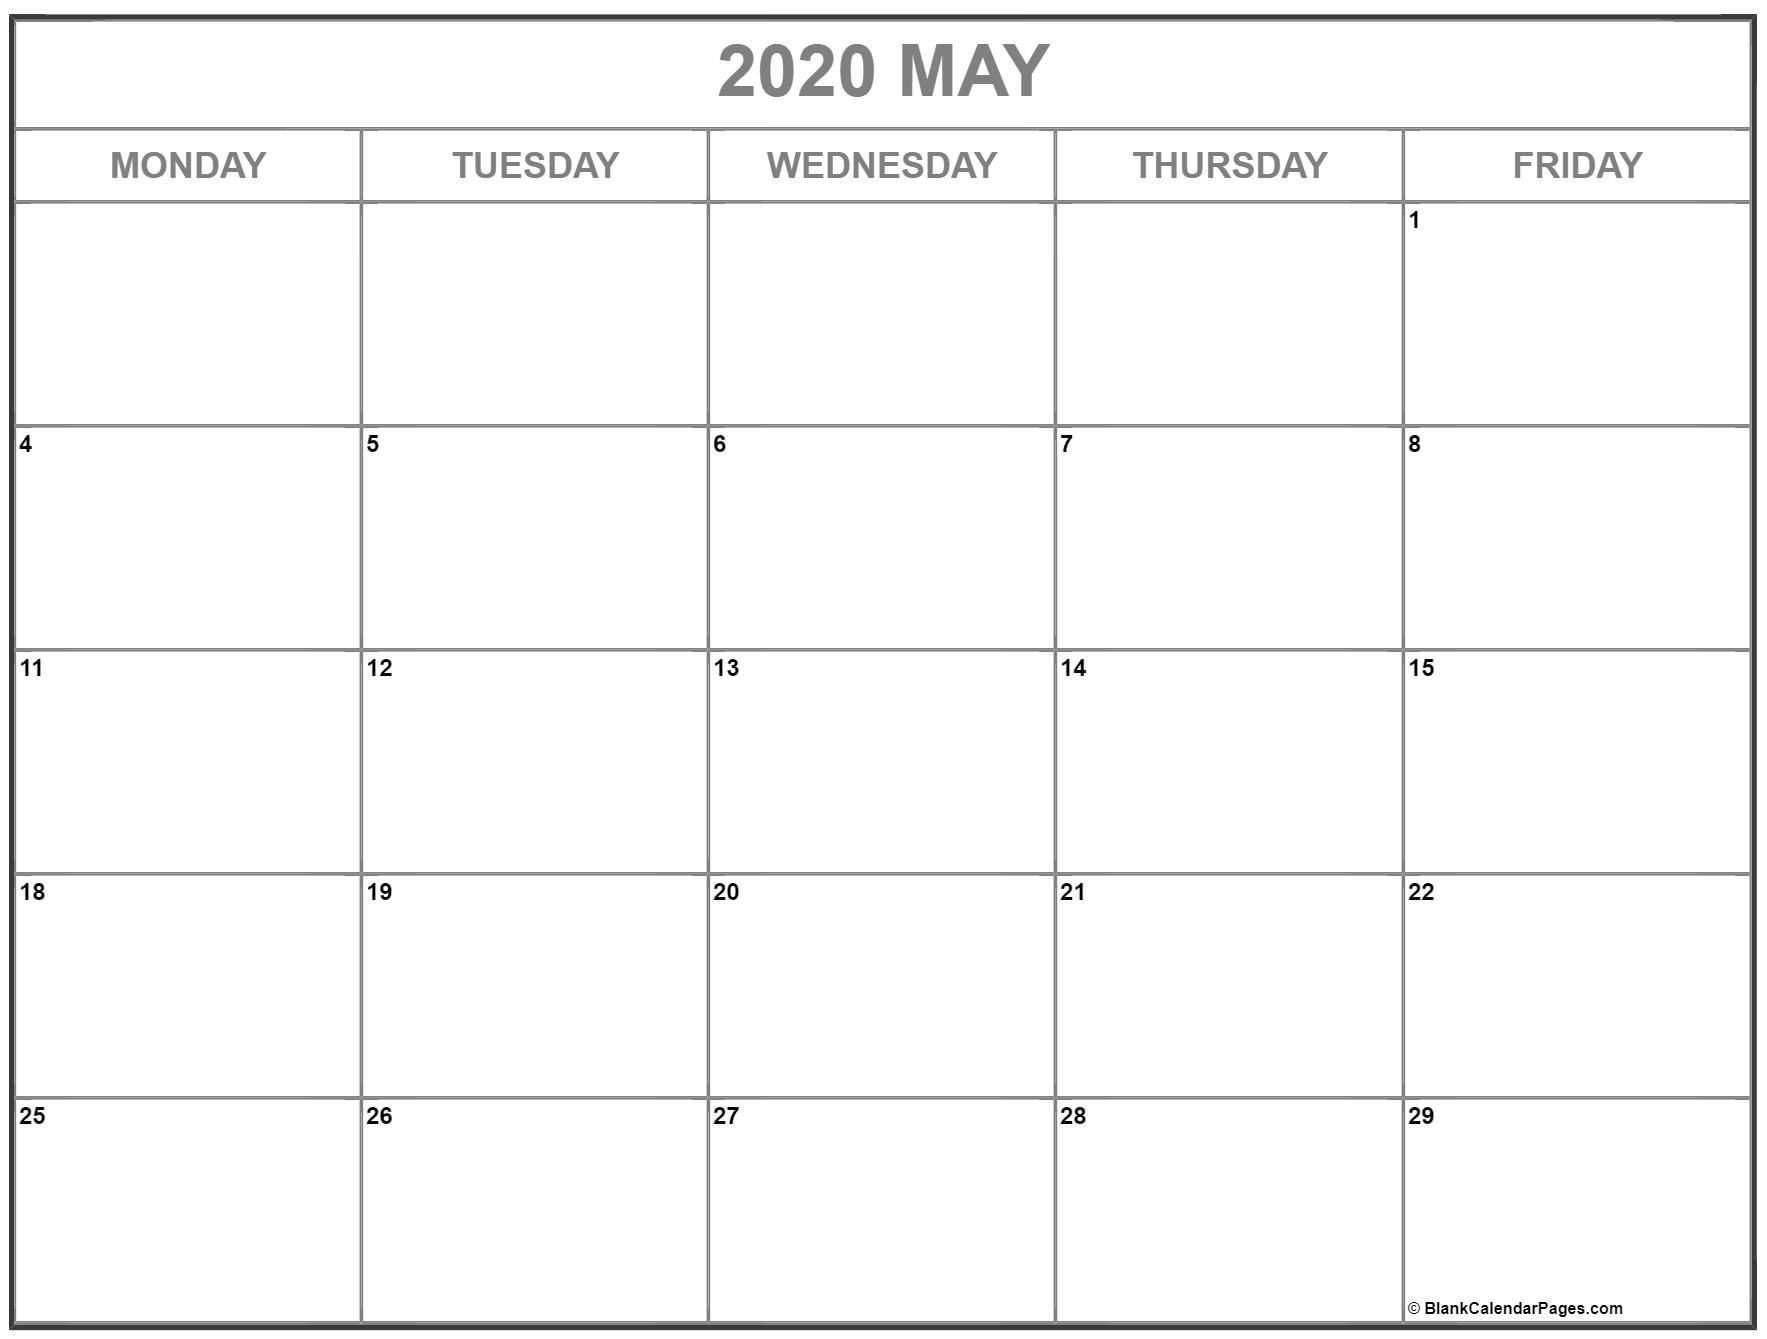 May 2020 Monday Calendar | Monday To Sunday Monday To Friday Printable Monthly Calendar